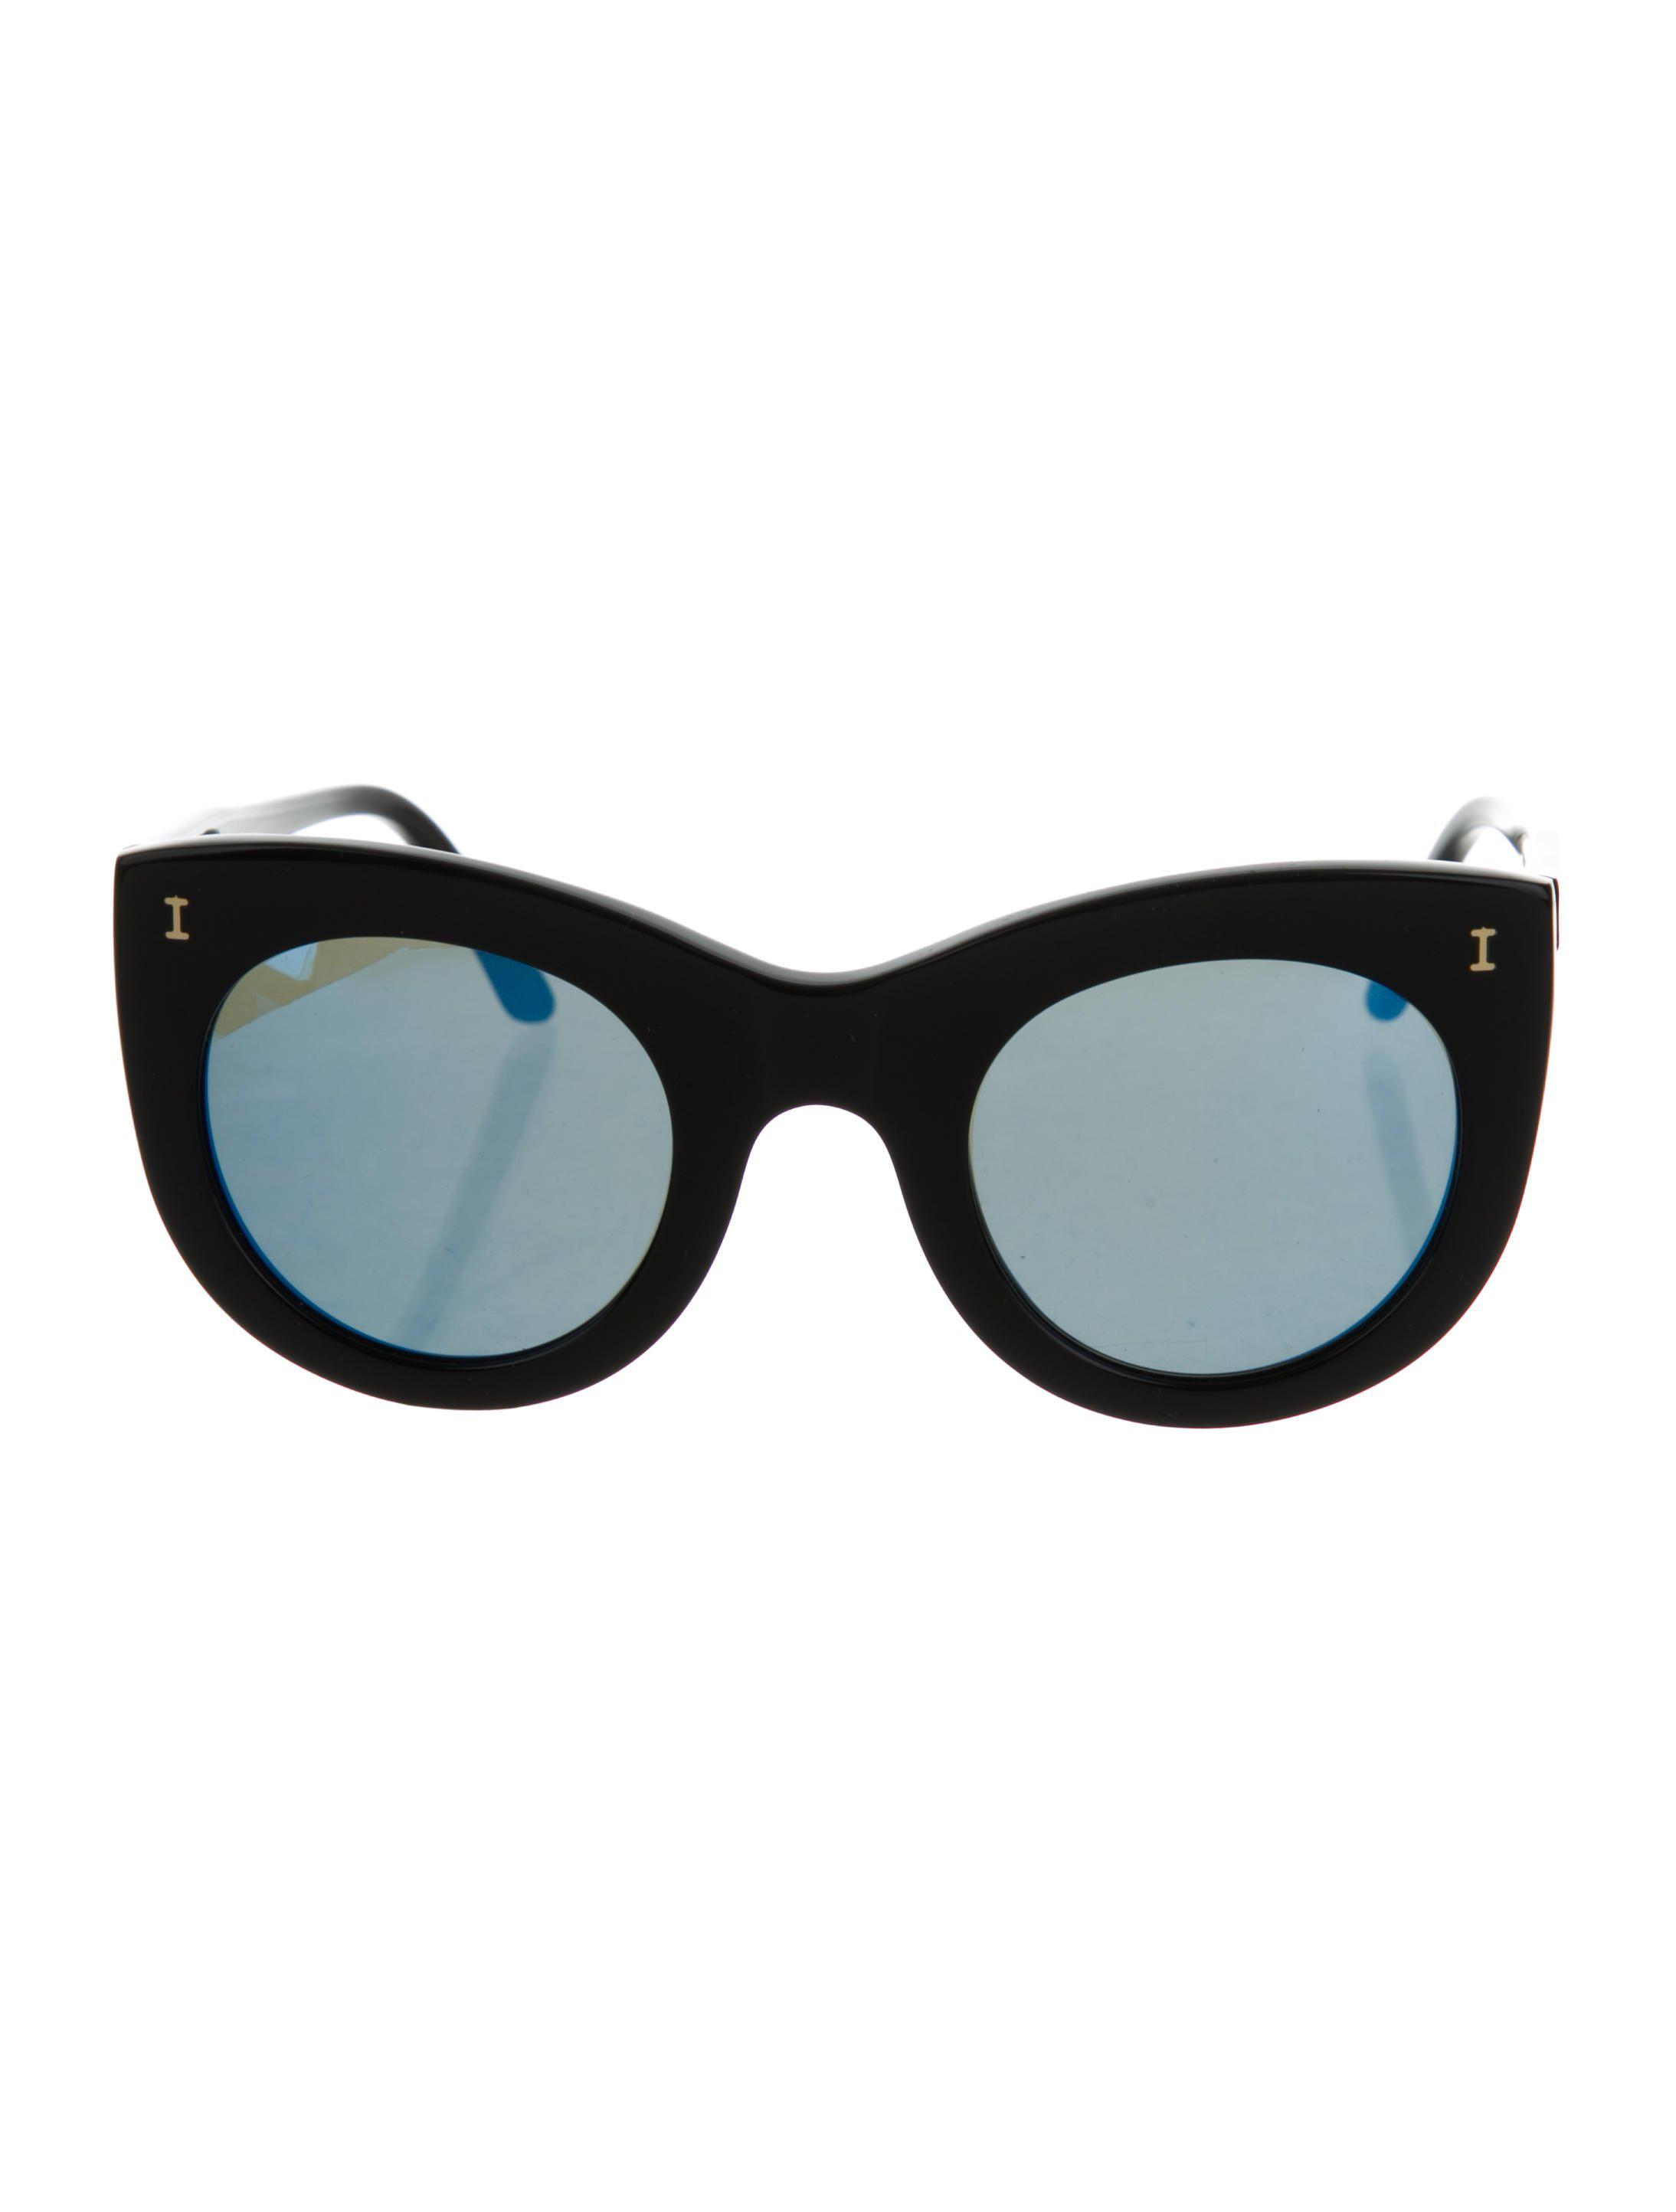 efadece775b Lyst - Illesteva Cat-eye Tinted Sunglasses in Black